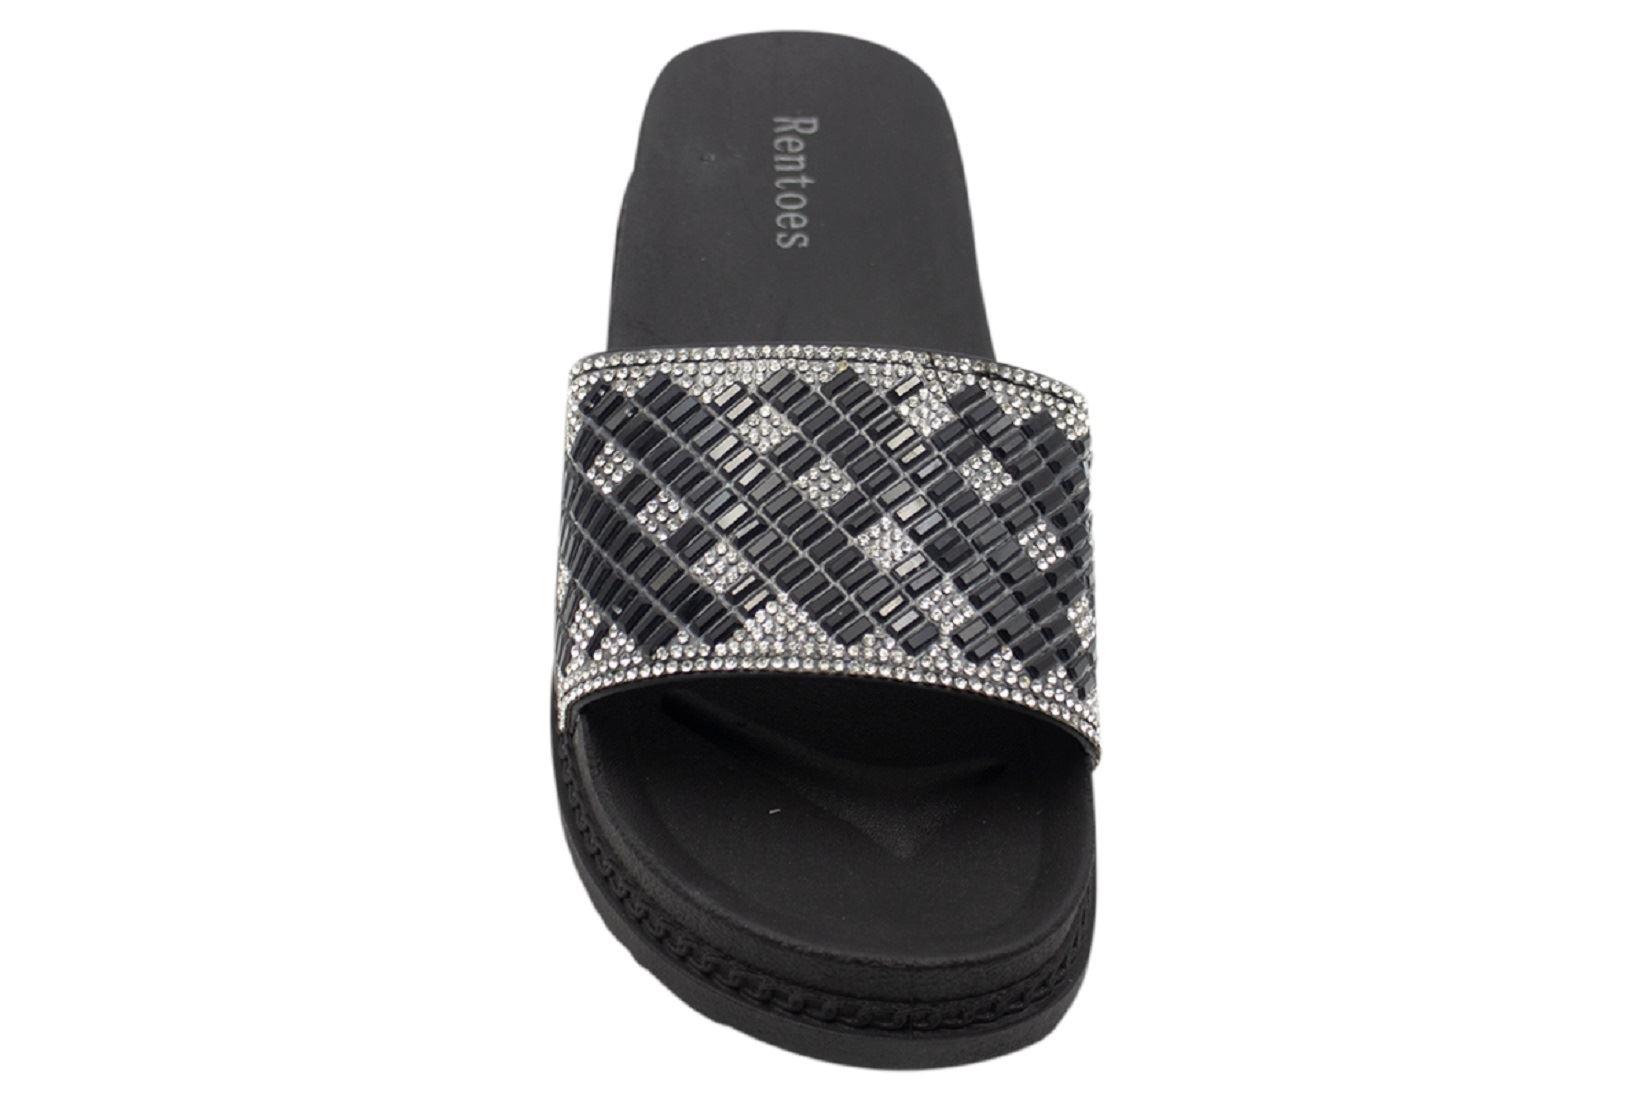 Womens-Sliders-Casual-Slippers-Mules-Ladies-Diamante-Flip-Flop-Sandals-Shoes thumbnail 37